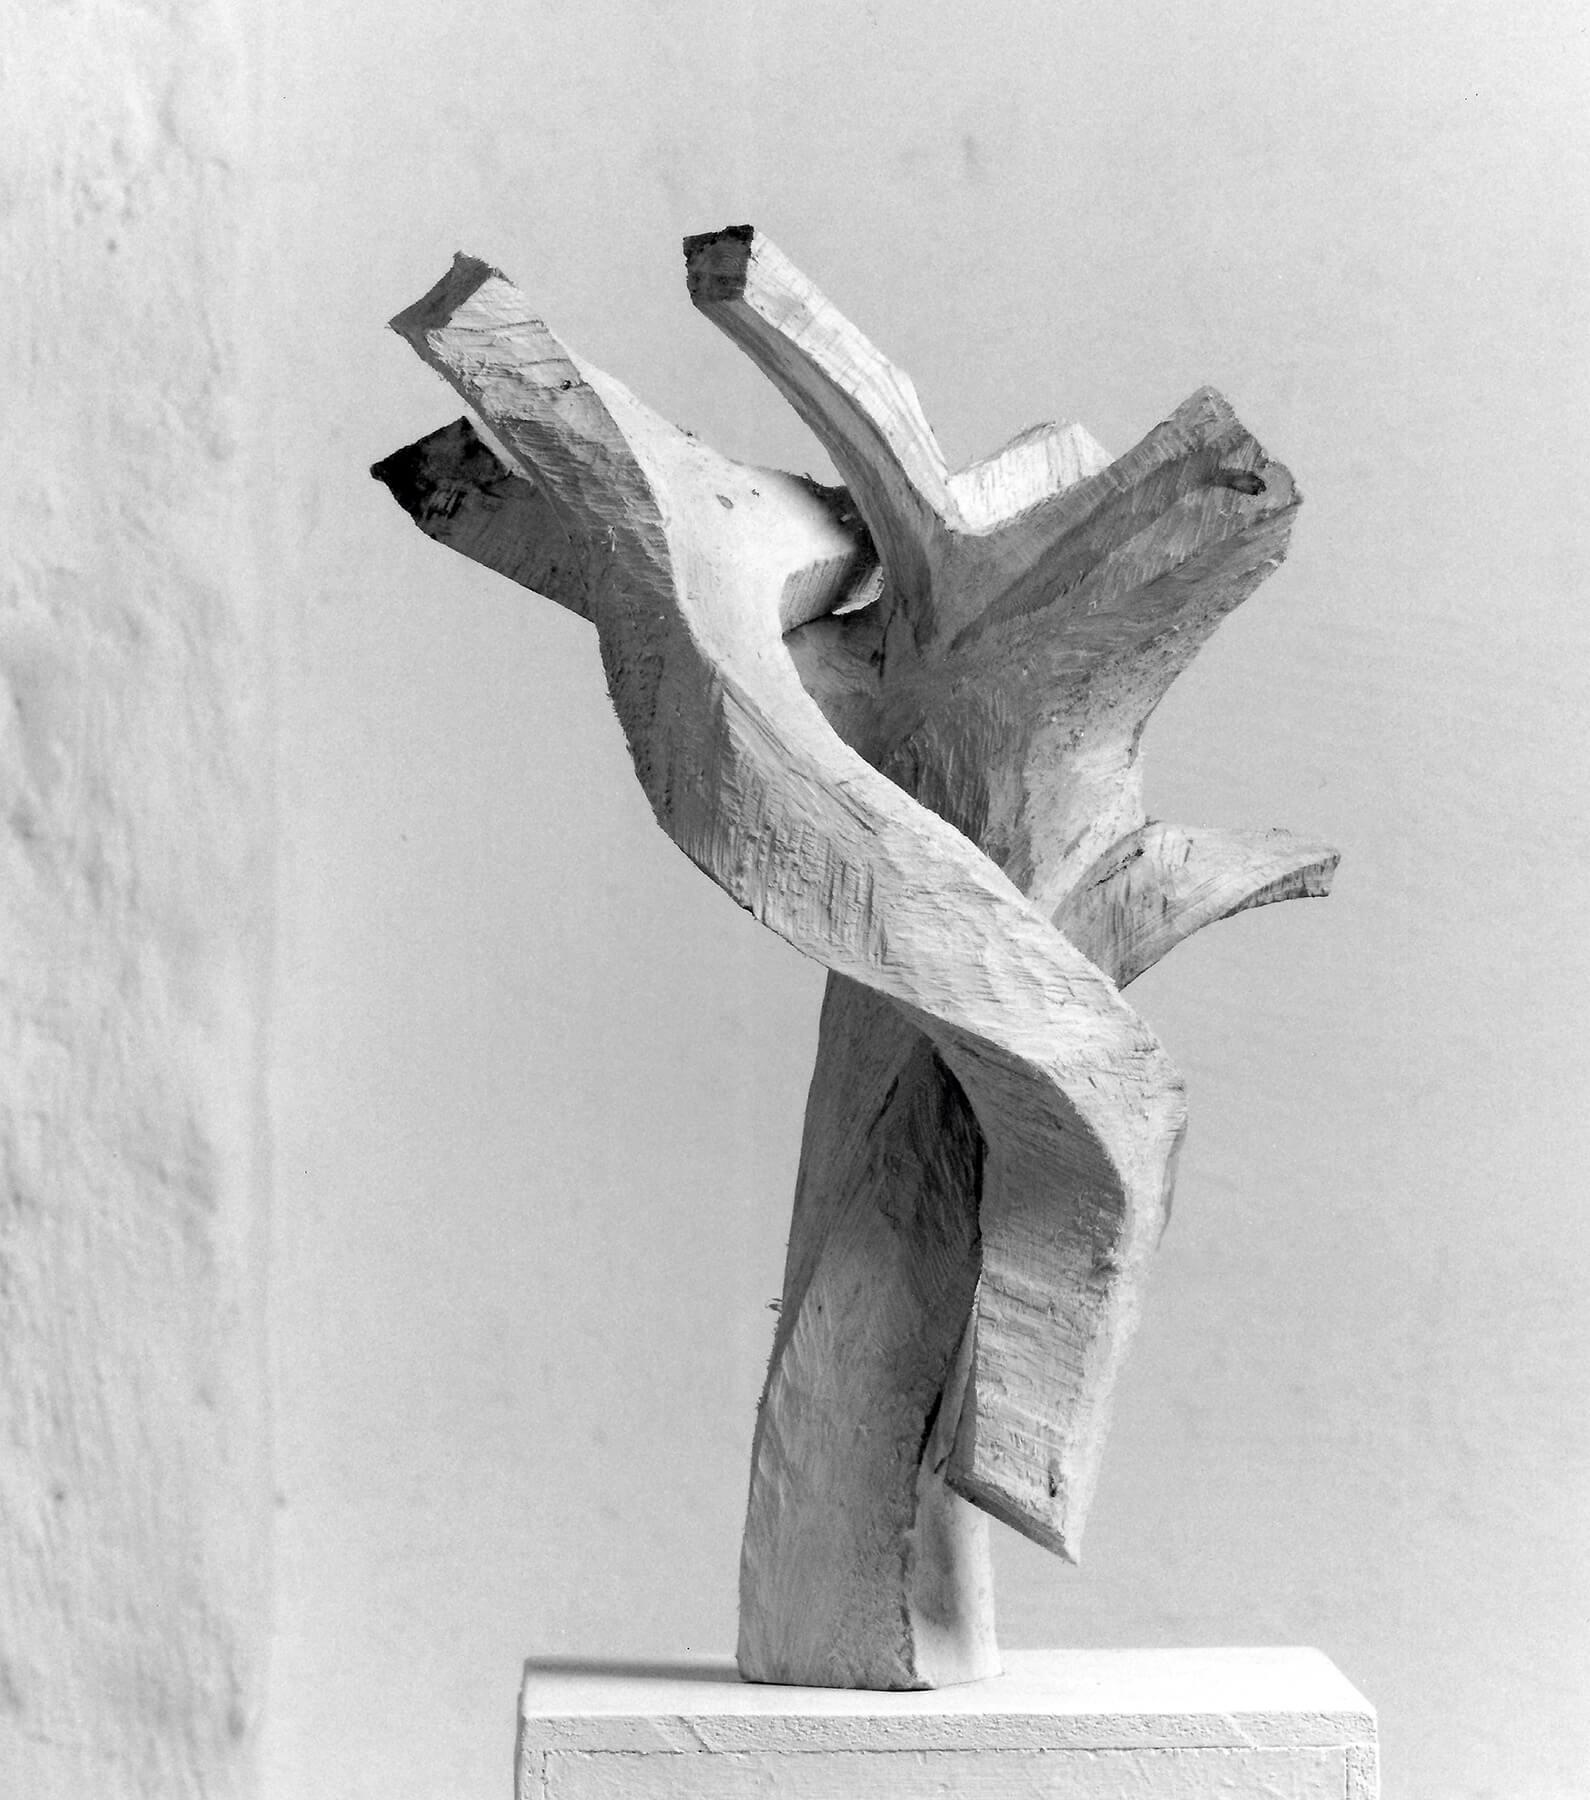 Bildhauer OMI Riesterer Skulpturen Winterreise Schubert Kiefer